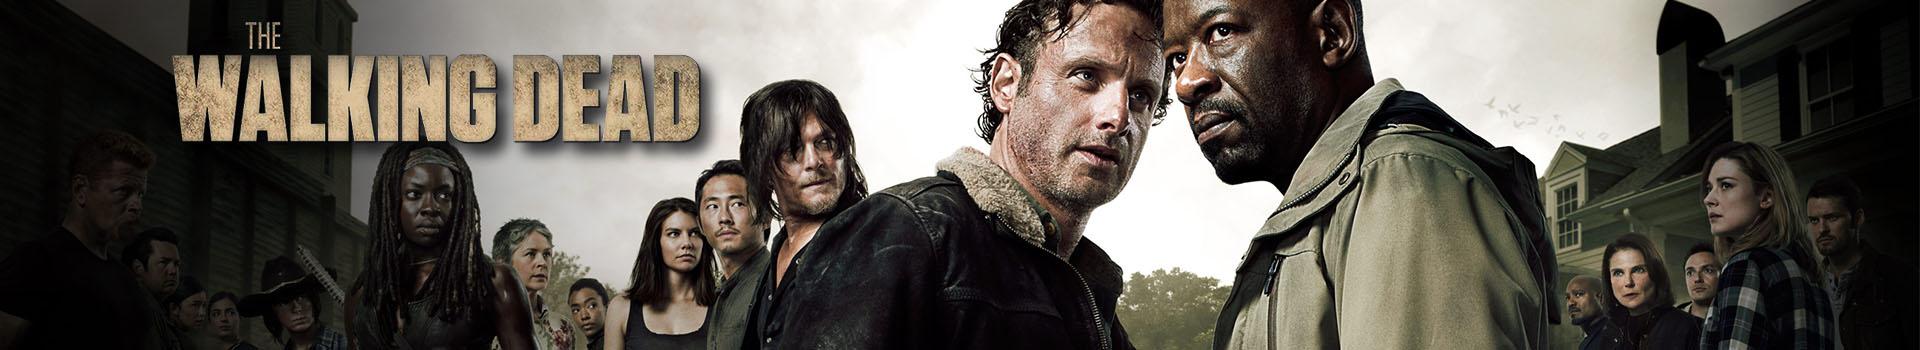 The Walking Dead - Figuren und Merchandise